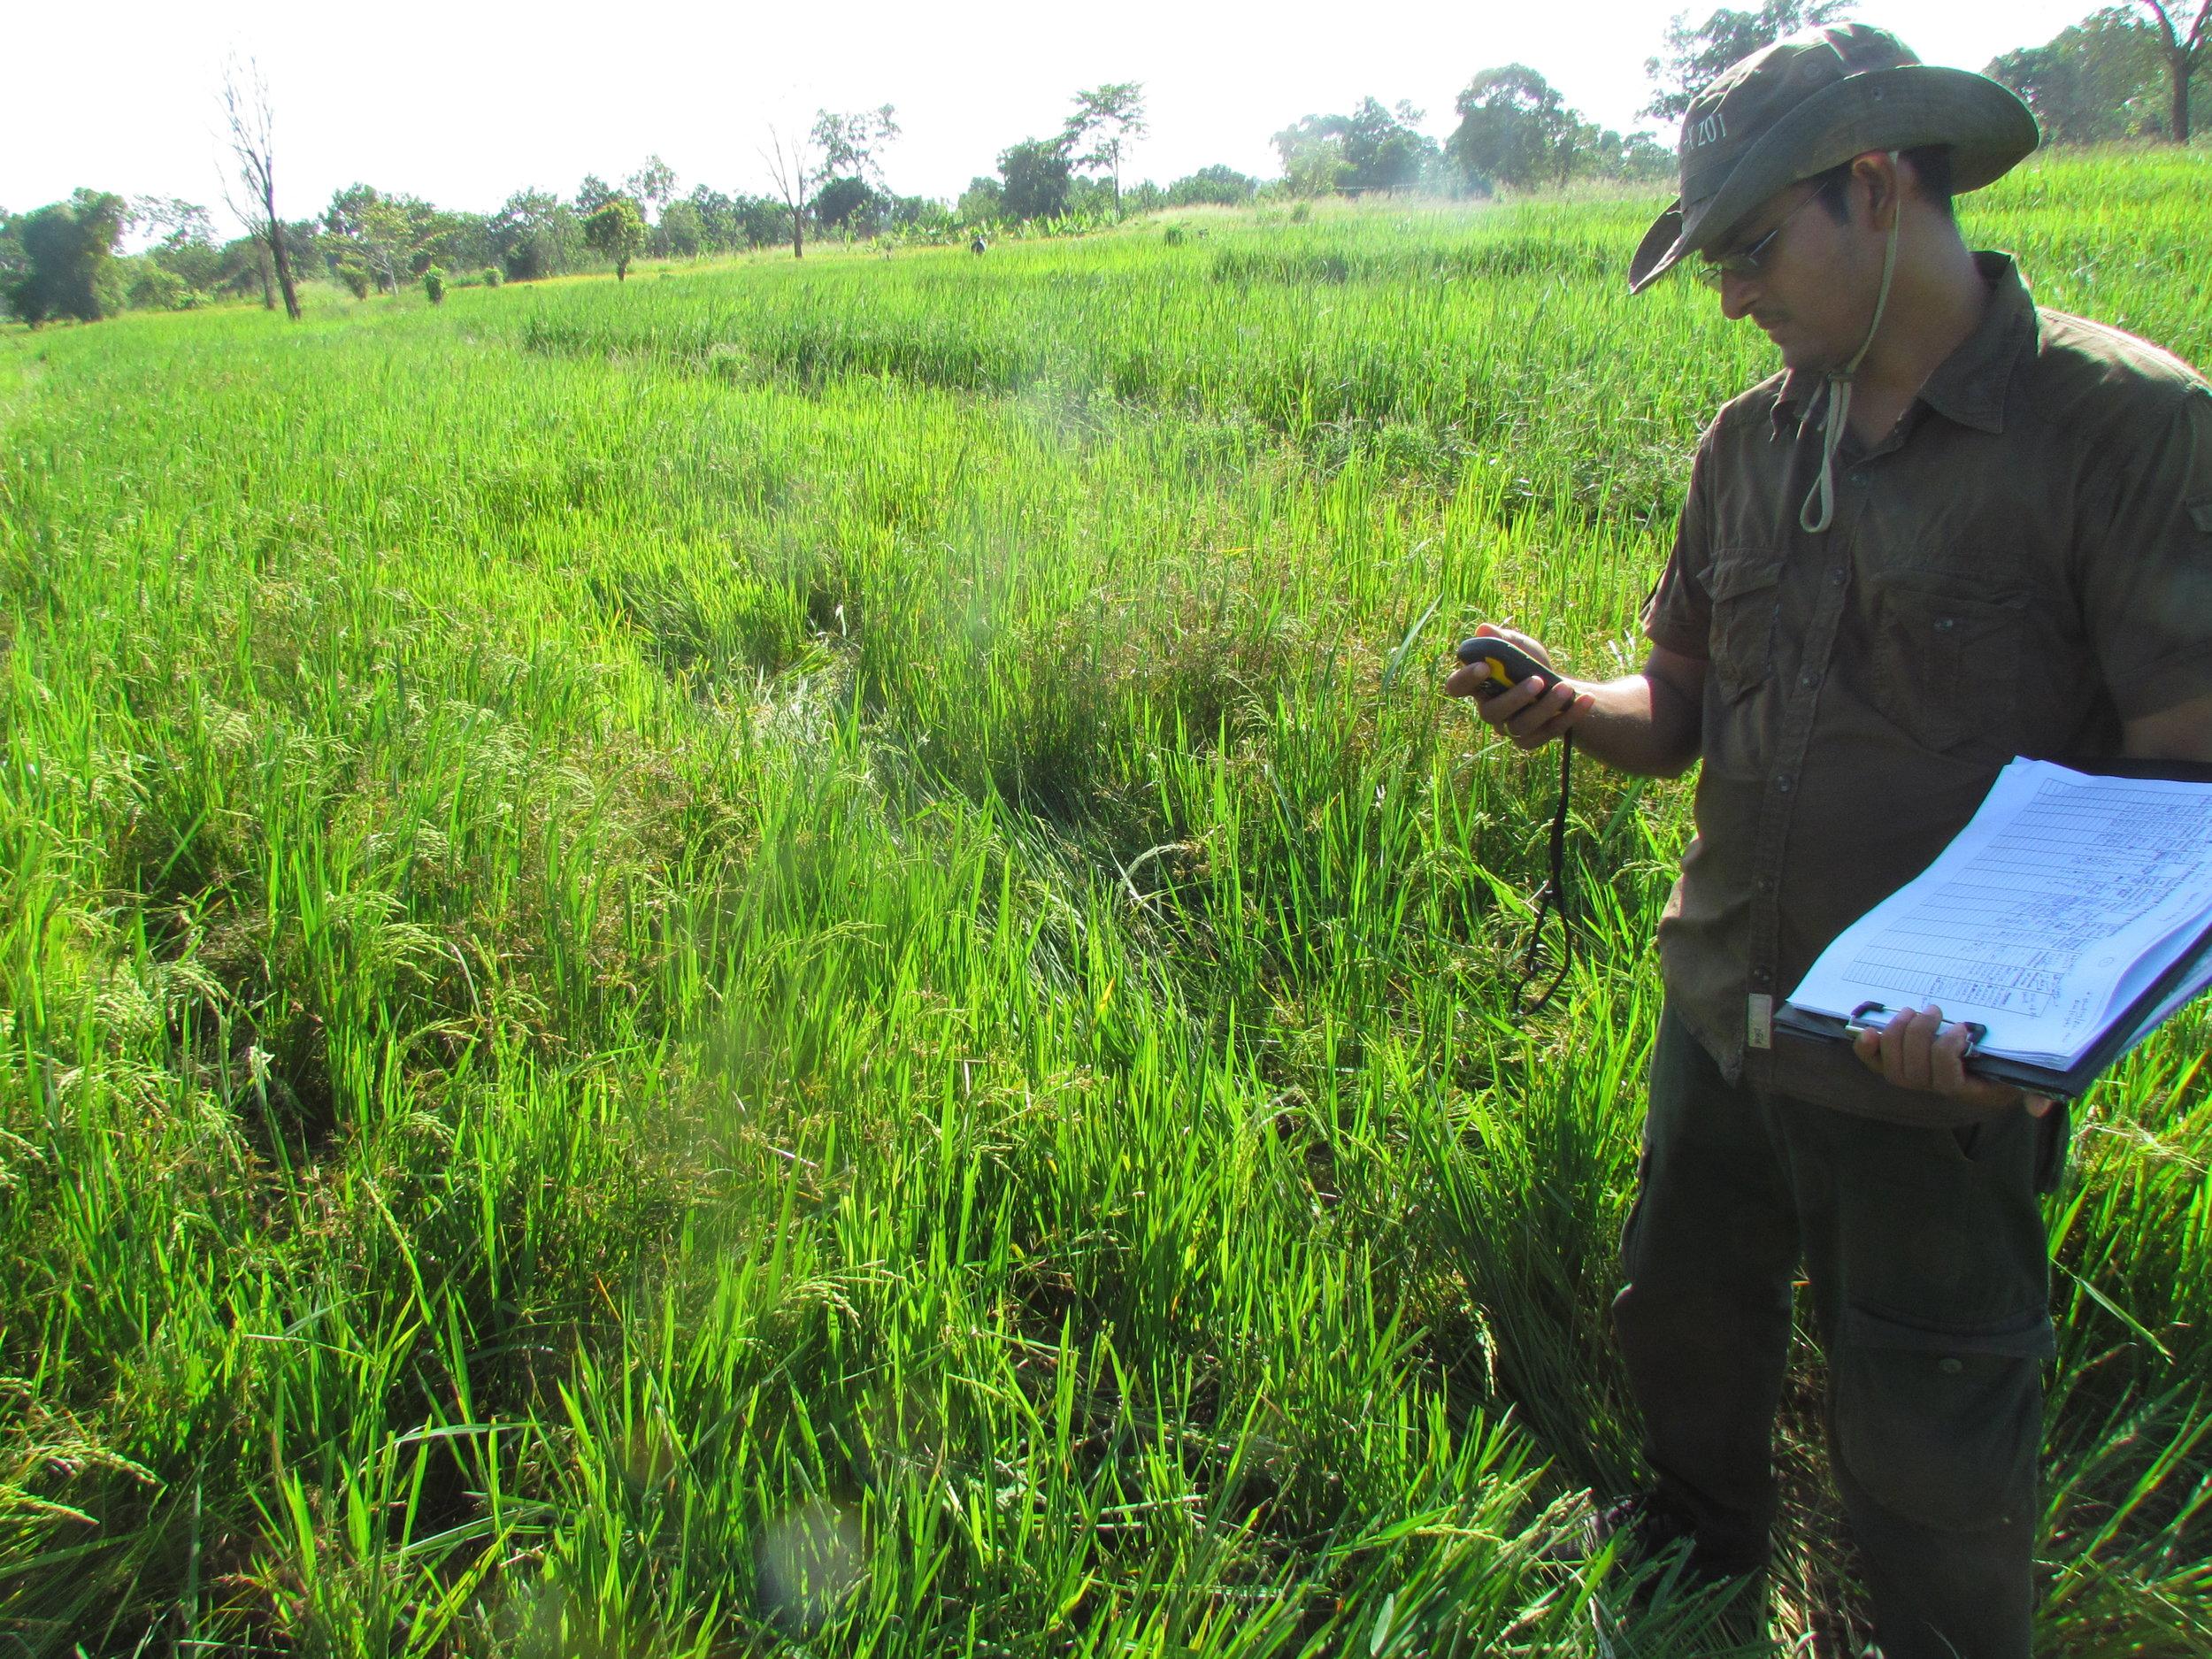 Ashoka monitoring elephant damages to crops in the villages bordering the Udawalawe National Park